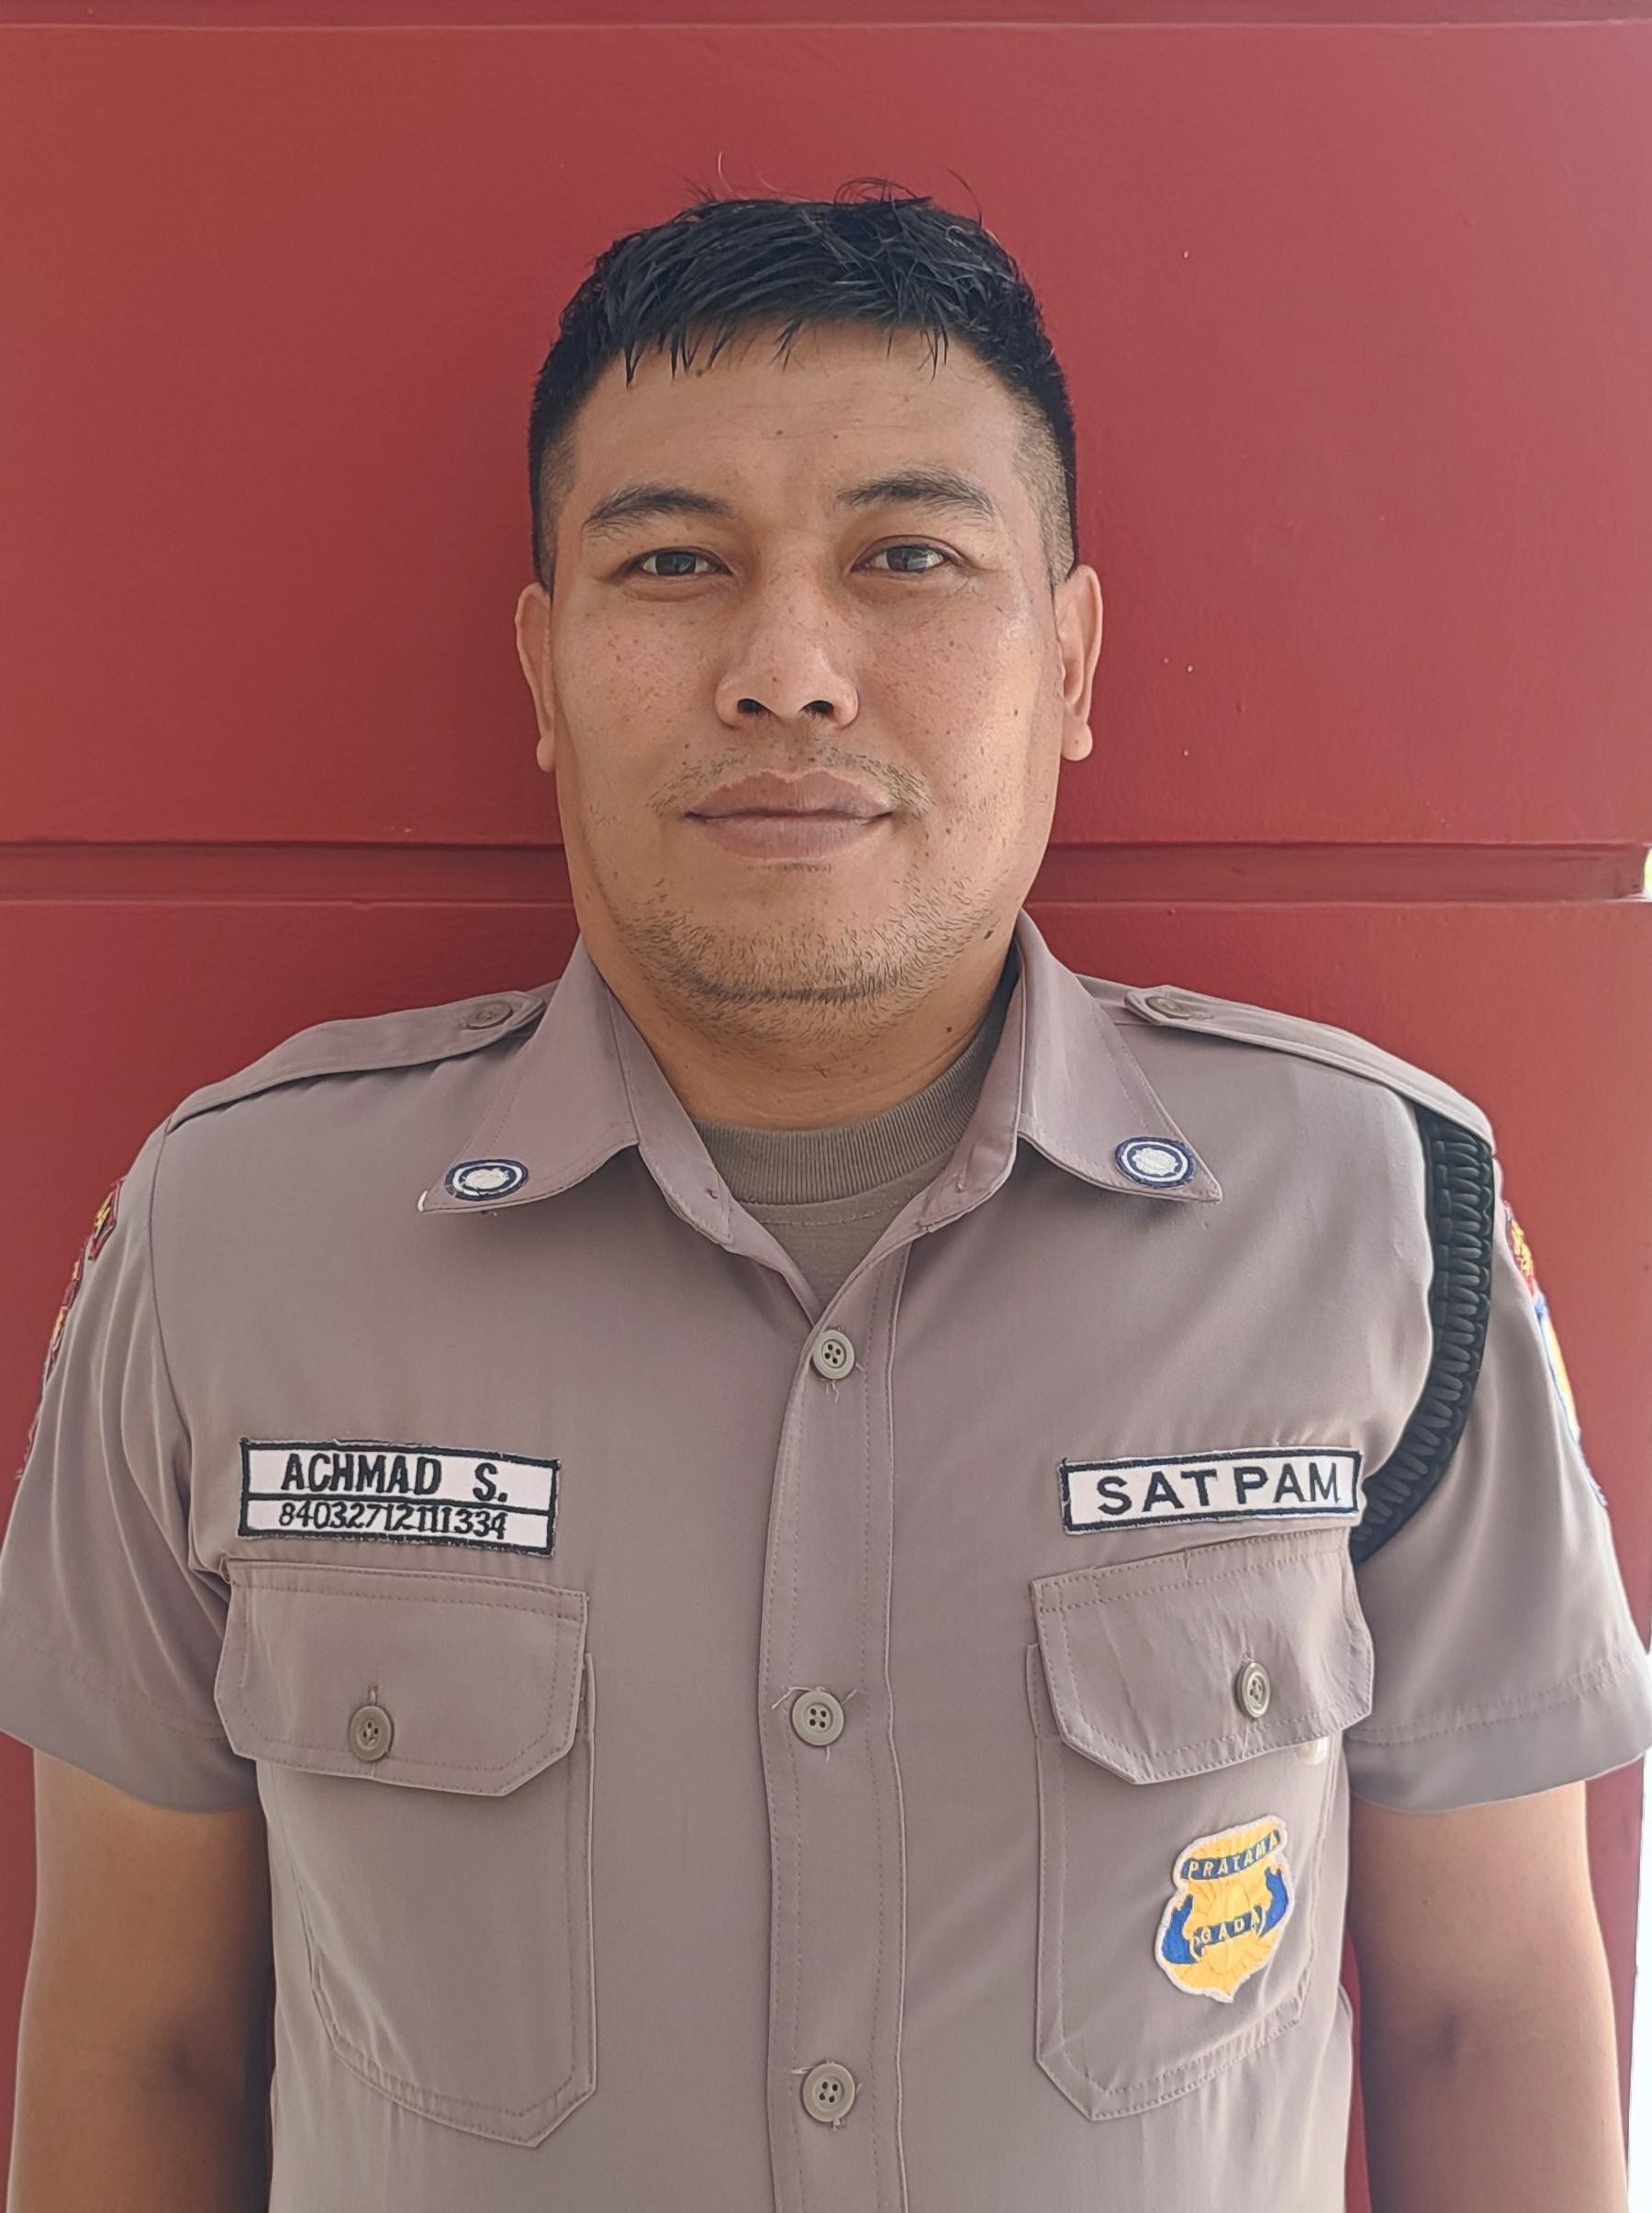 Achmad Suhandono